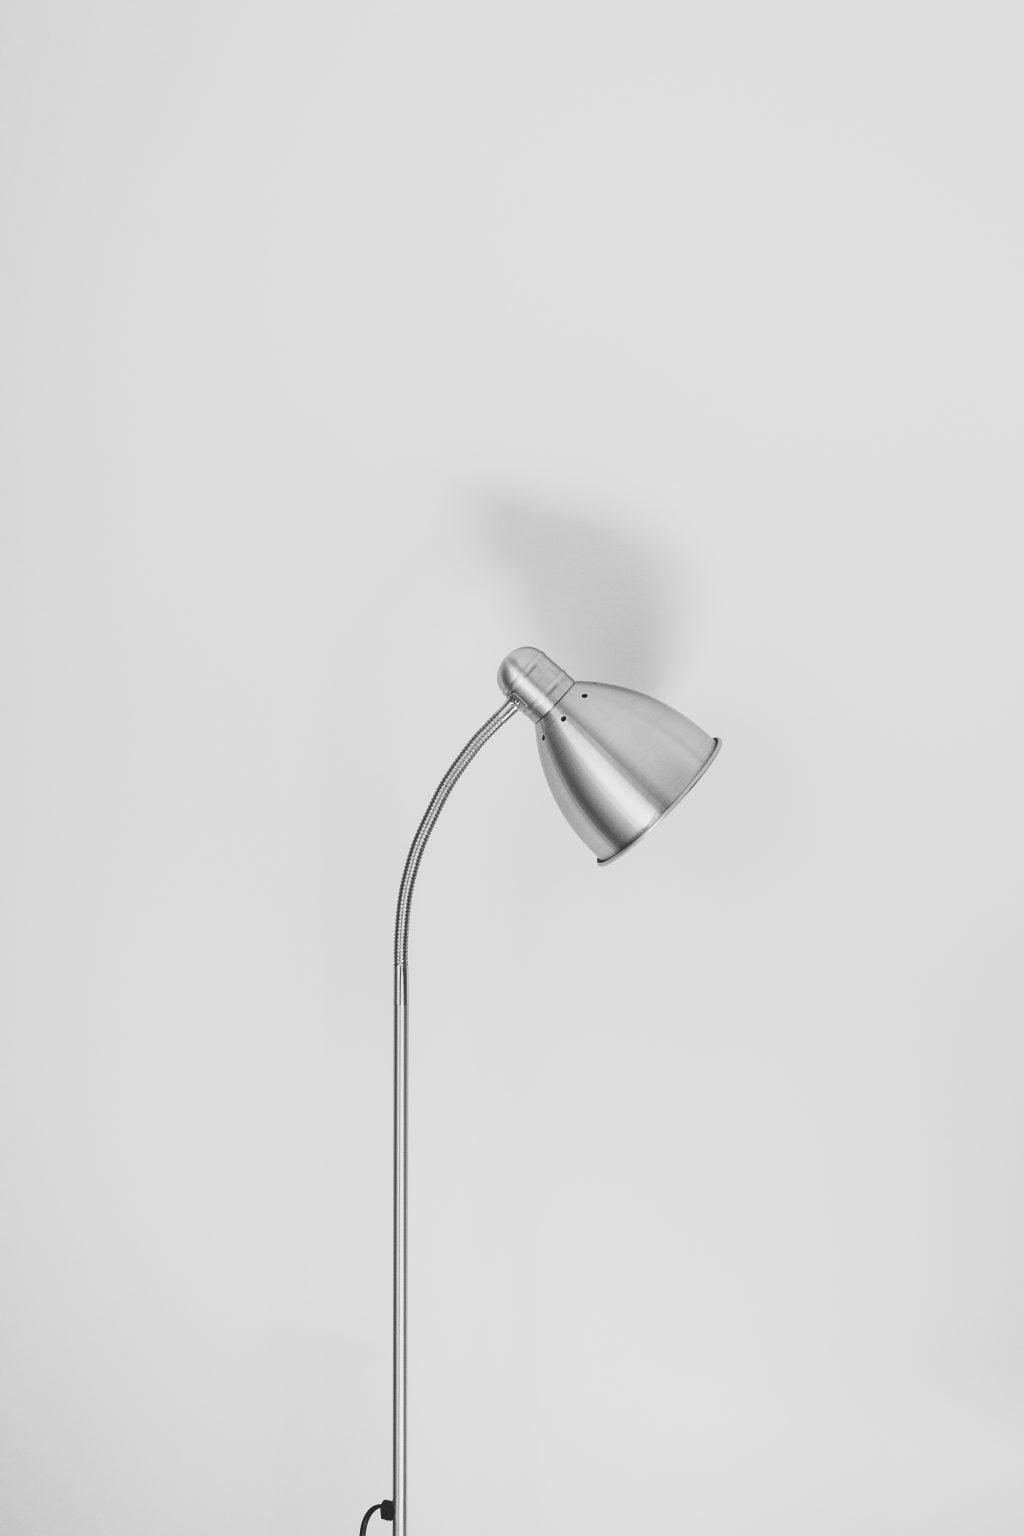 Metal desk lamp - free stock photo